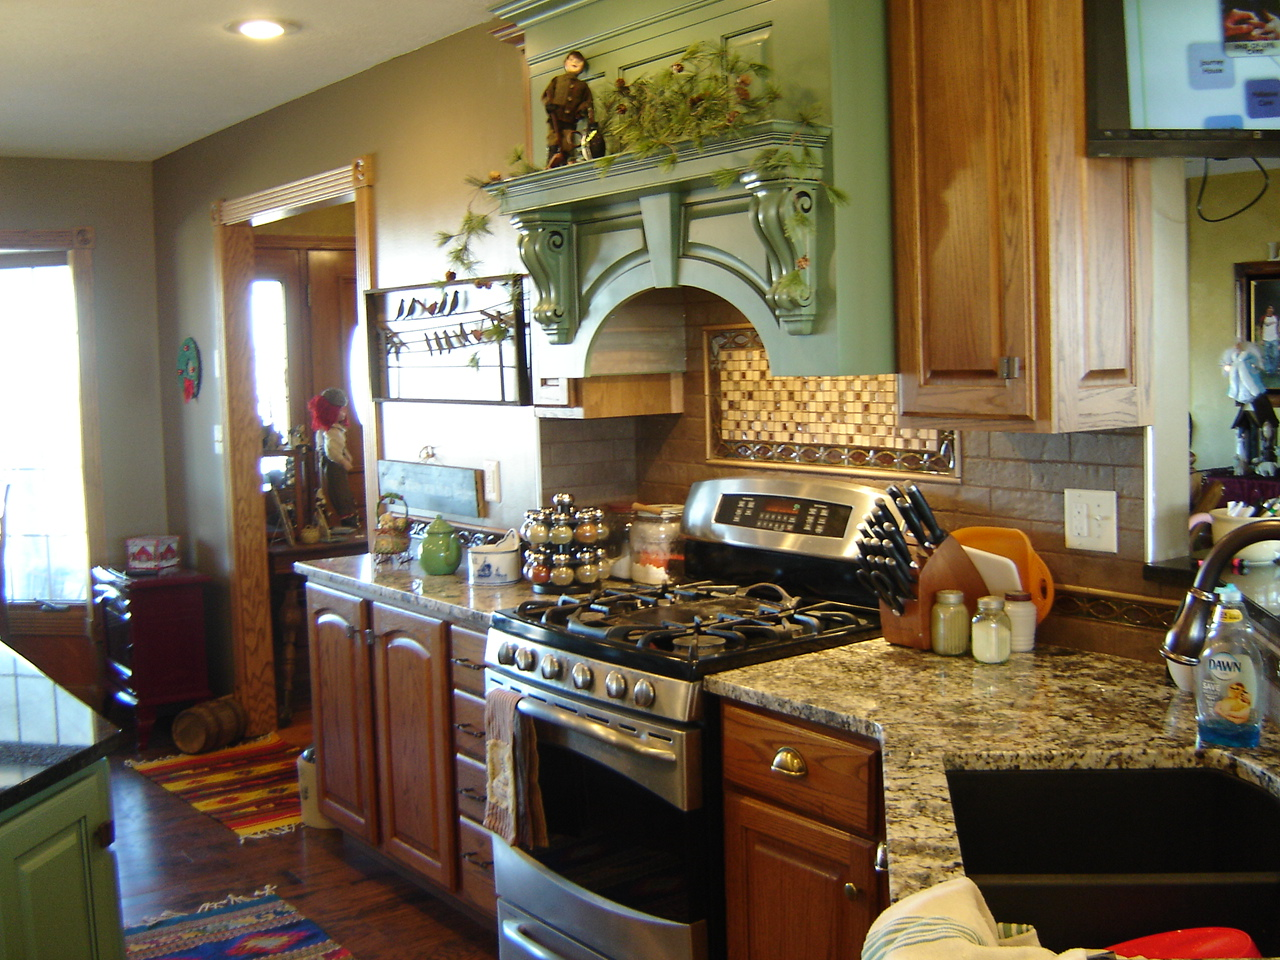 sasse kitchen remodel diller ne kitchen remodeling lincoln ne Sasse Kitchen Remodel Diller NE Schuster Design Studio Inc Beatrice NE Lincoln NE Omaha Nebraska